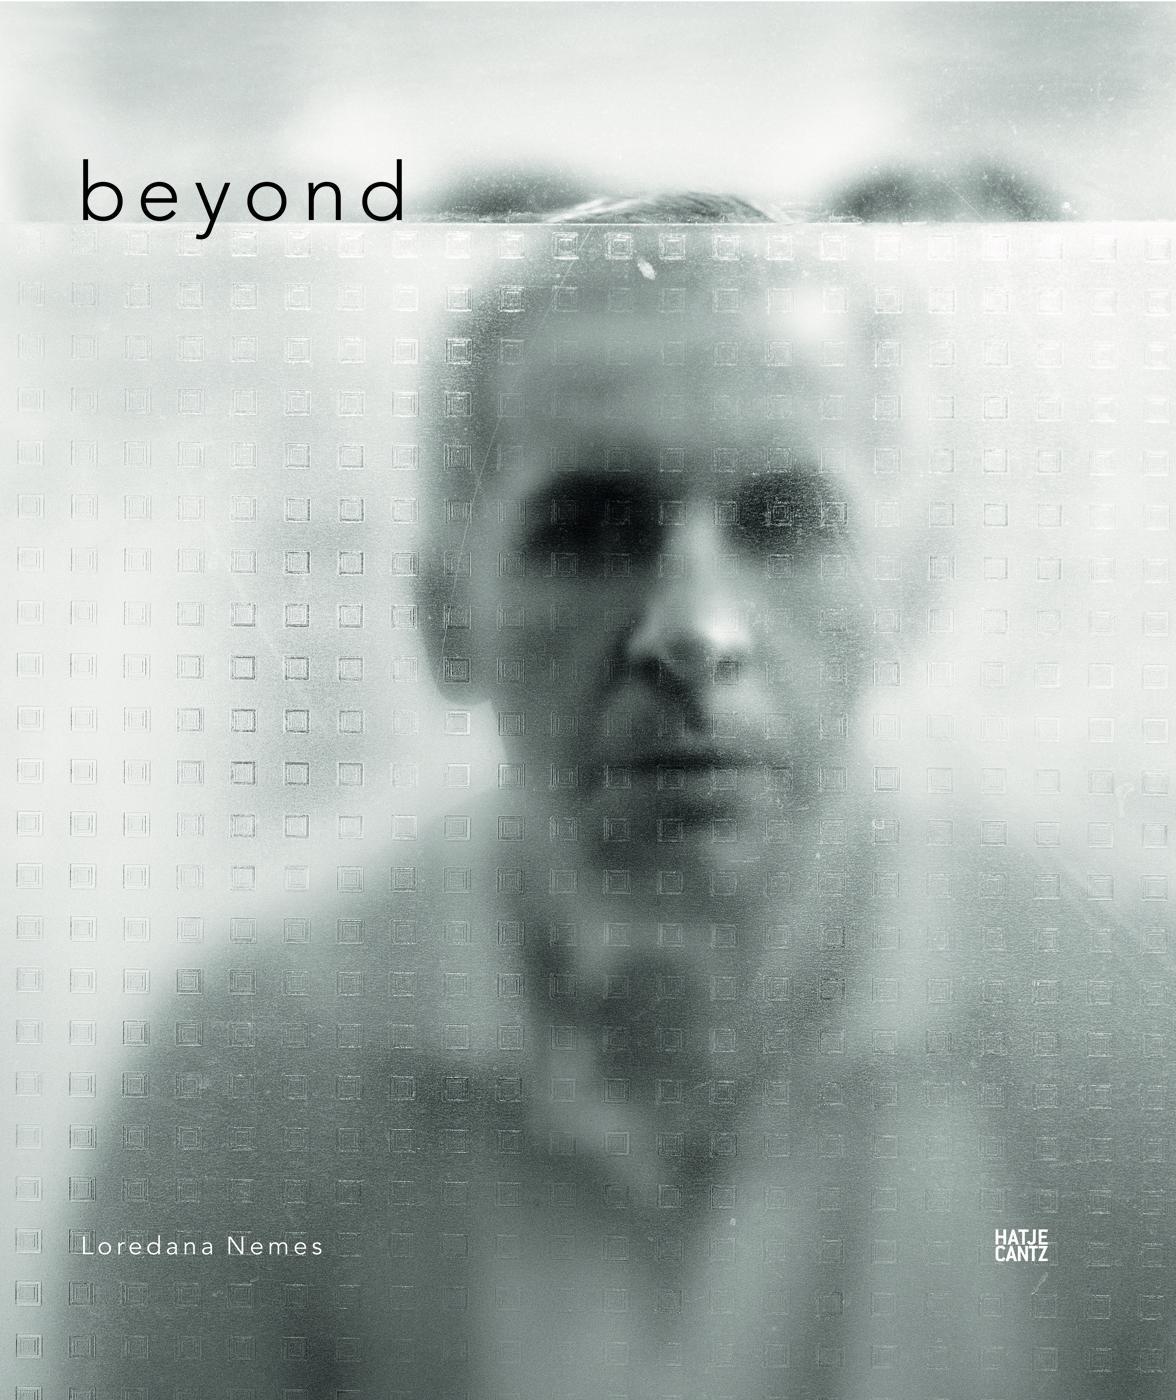 beyond – Loredana Nemes, ISBN 978-3-7757-2697-9